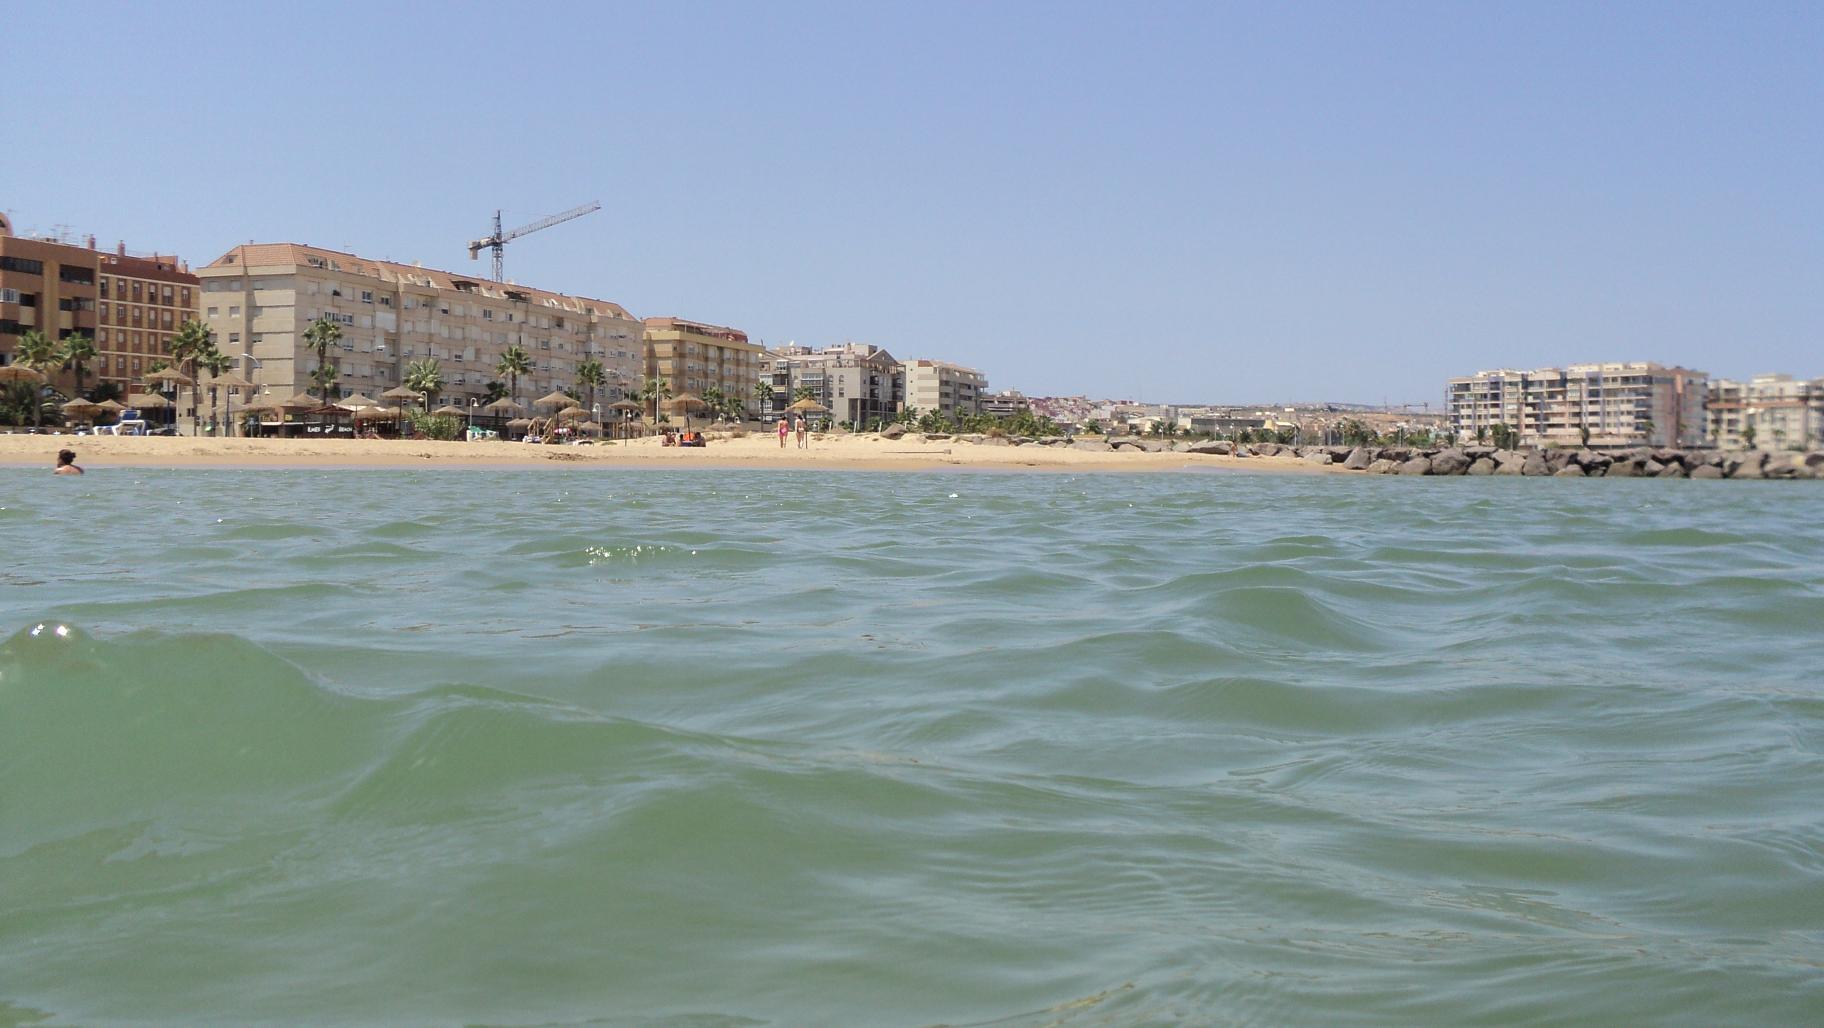 Playa Los Cárabos